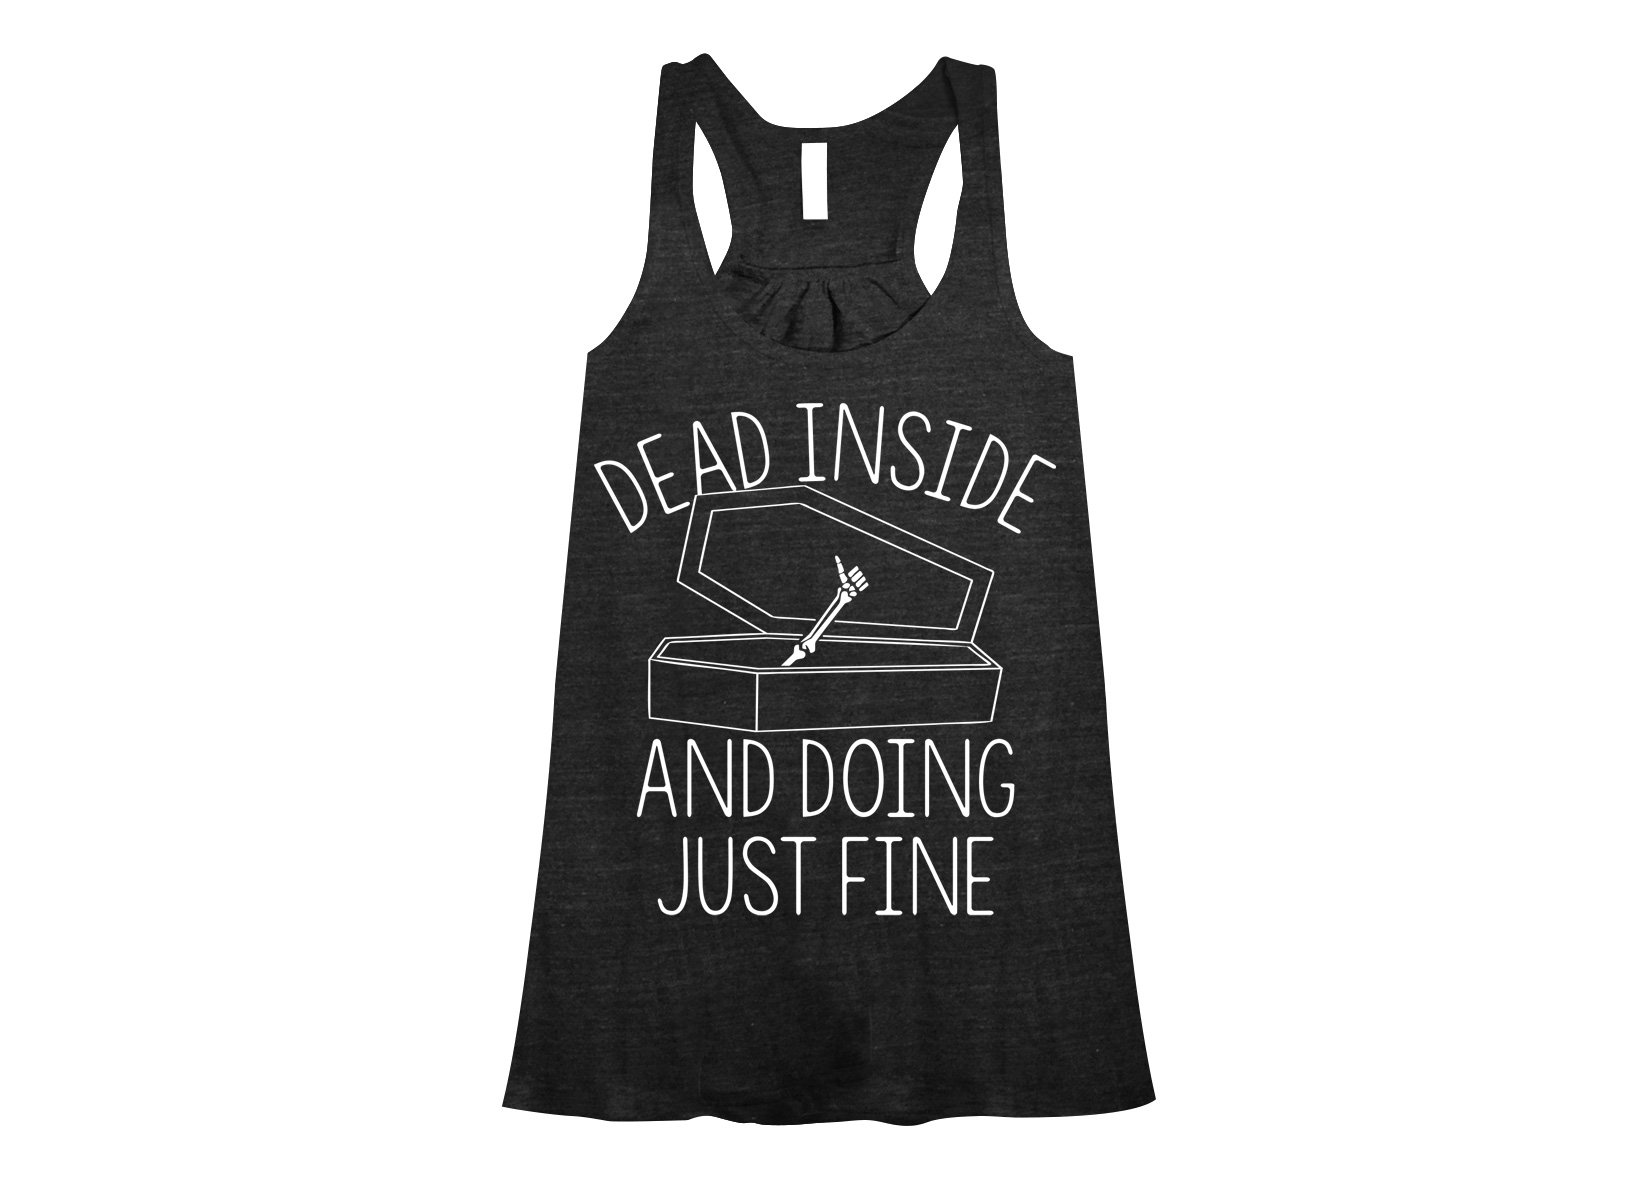 Dead Inside And Doing Fine on Womens Tanks T-Shirt